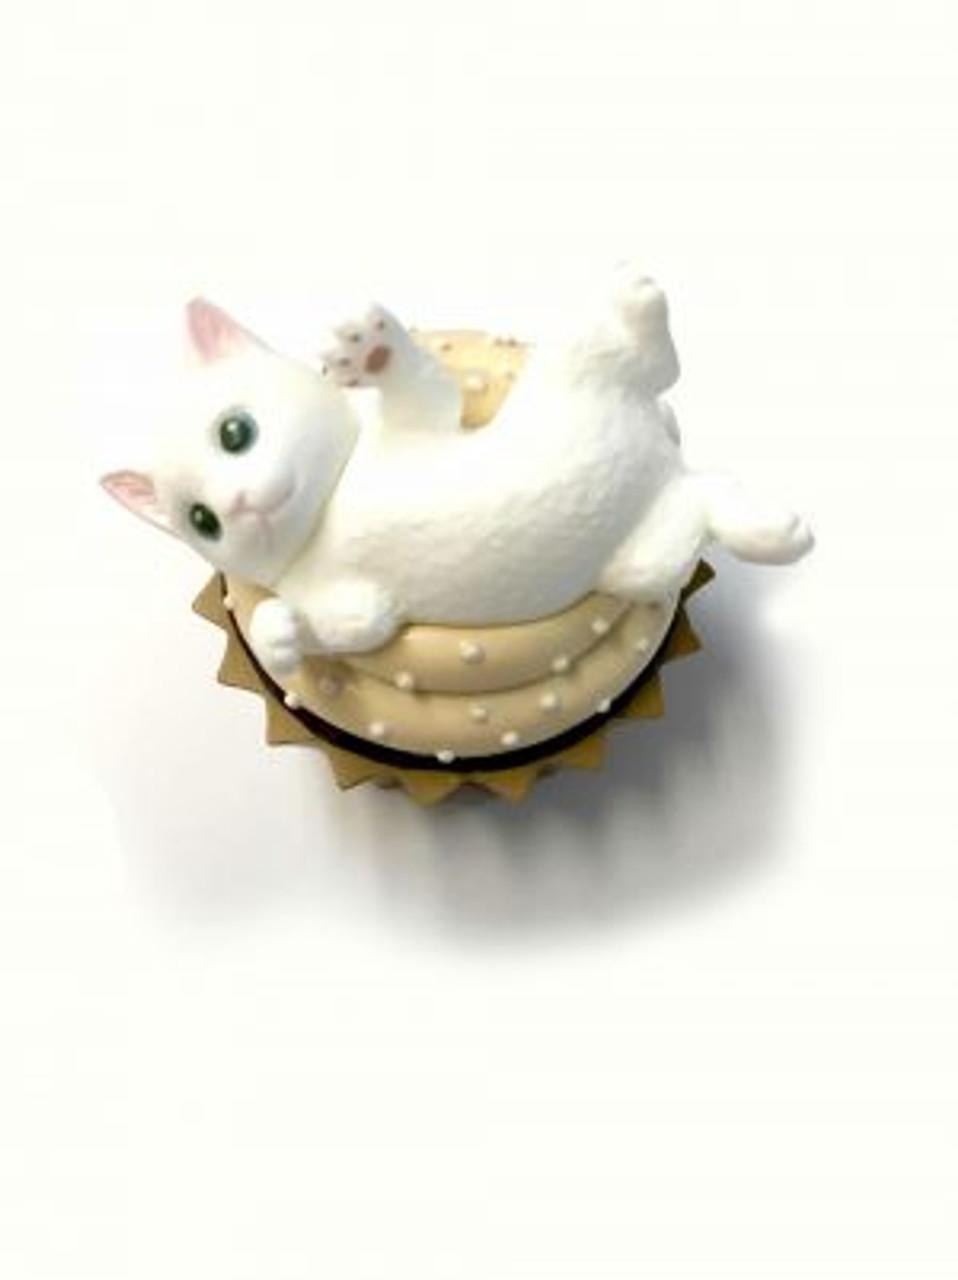 Blind Box ~ Café du Meow Keyring  ~ 1 of 8 Random Figurines